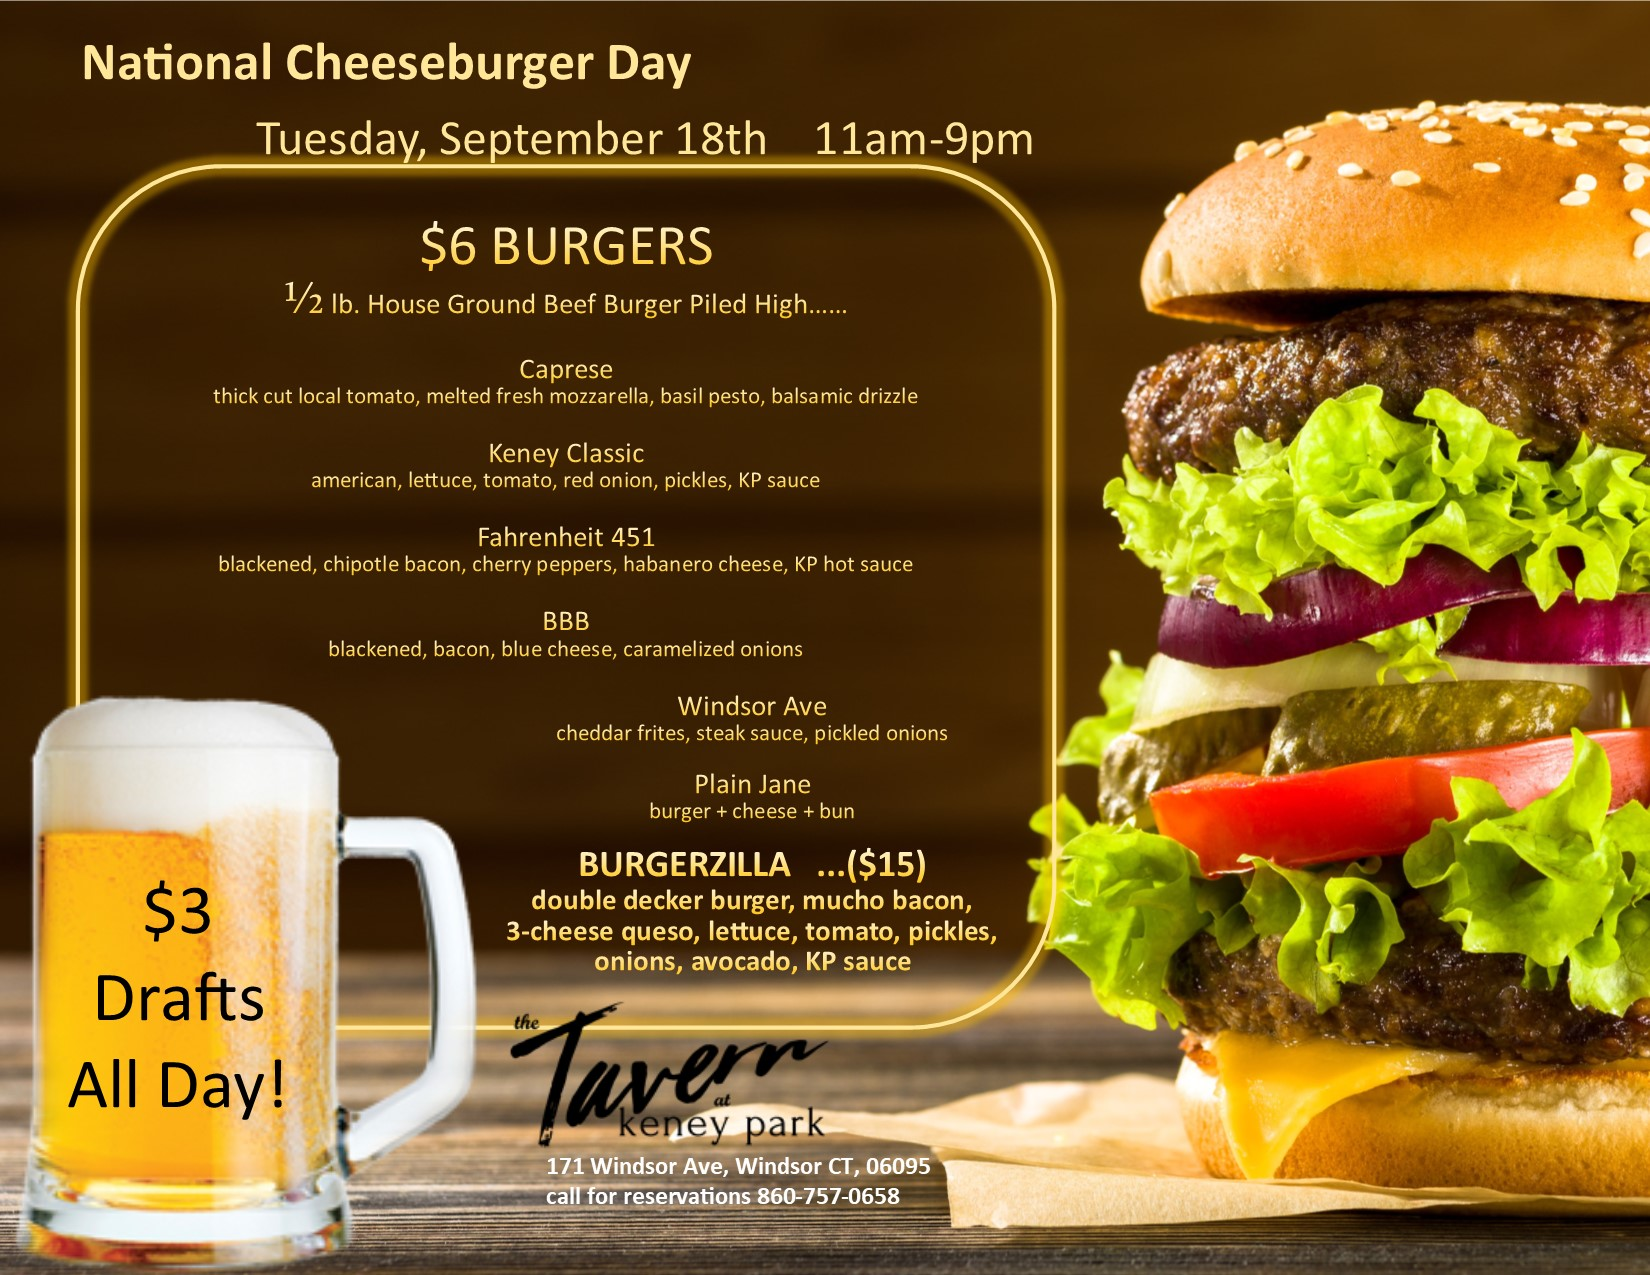 9-18-18 cheeseburger.jpg